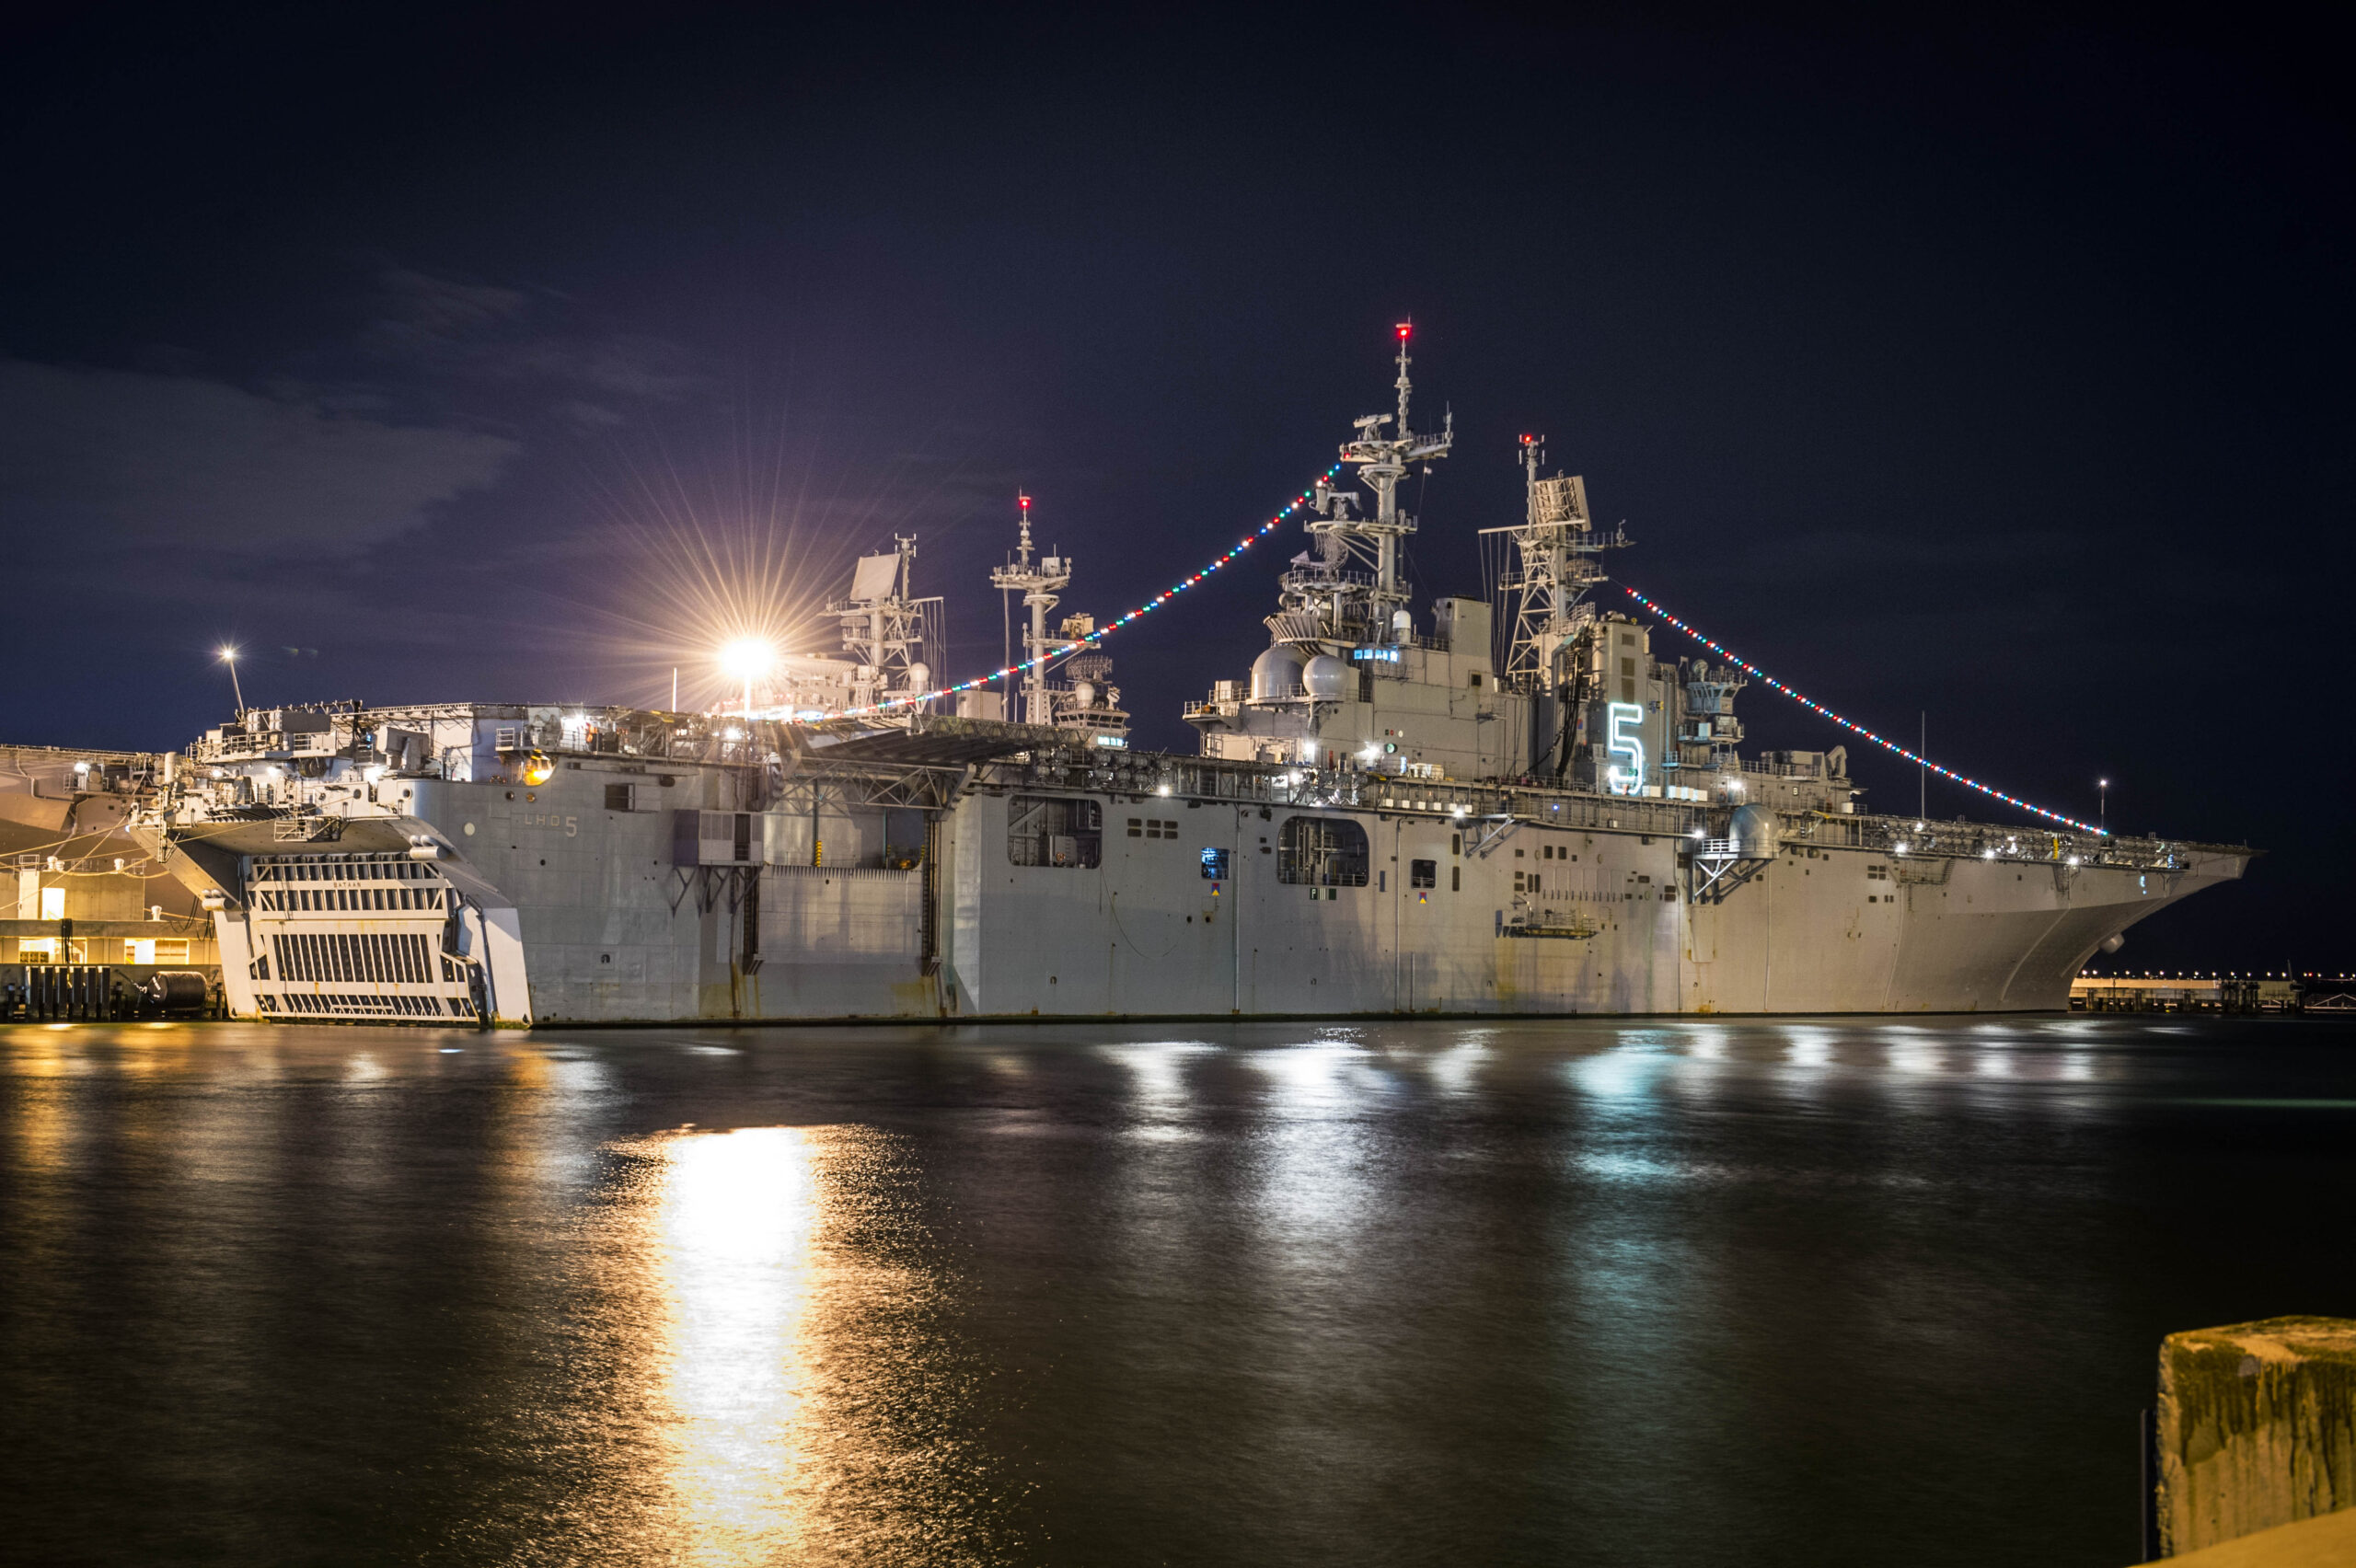 Naval Lighting image